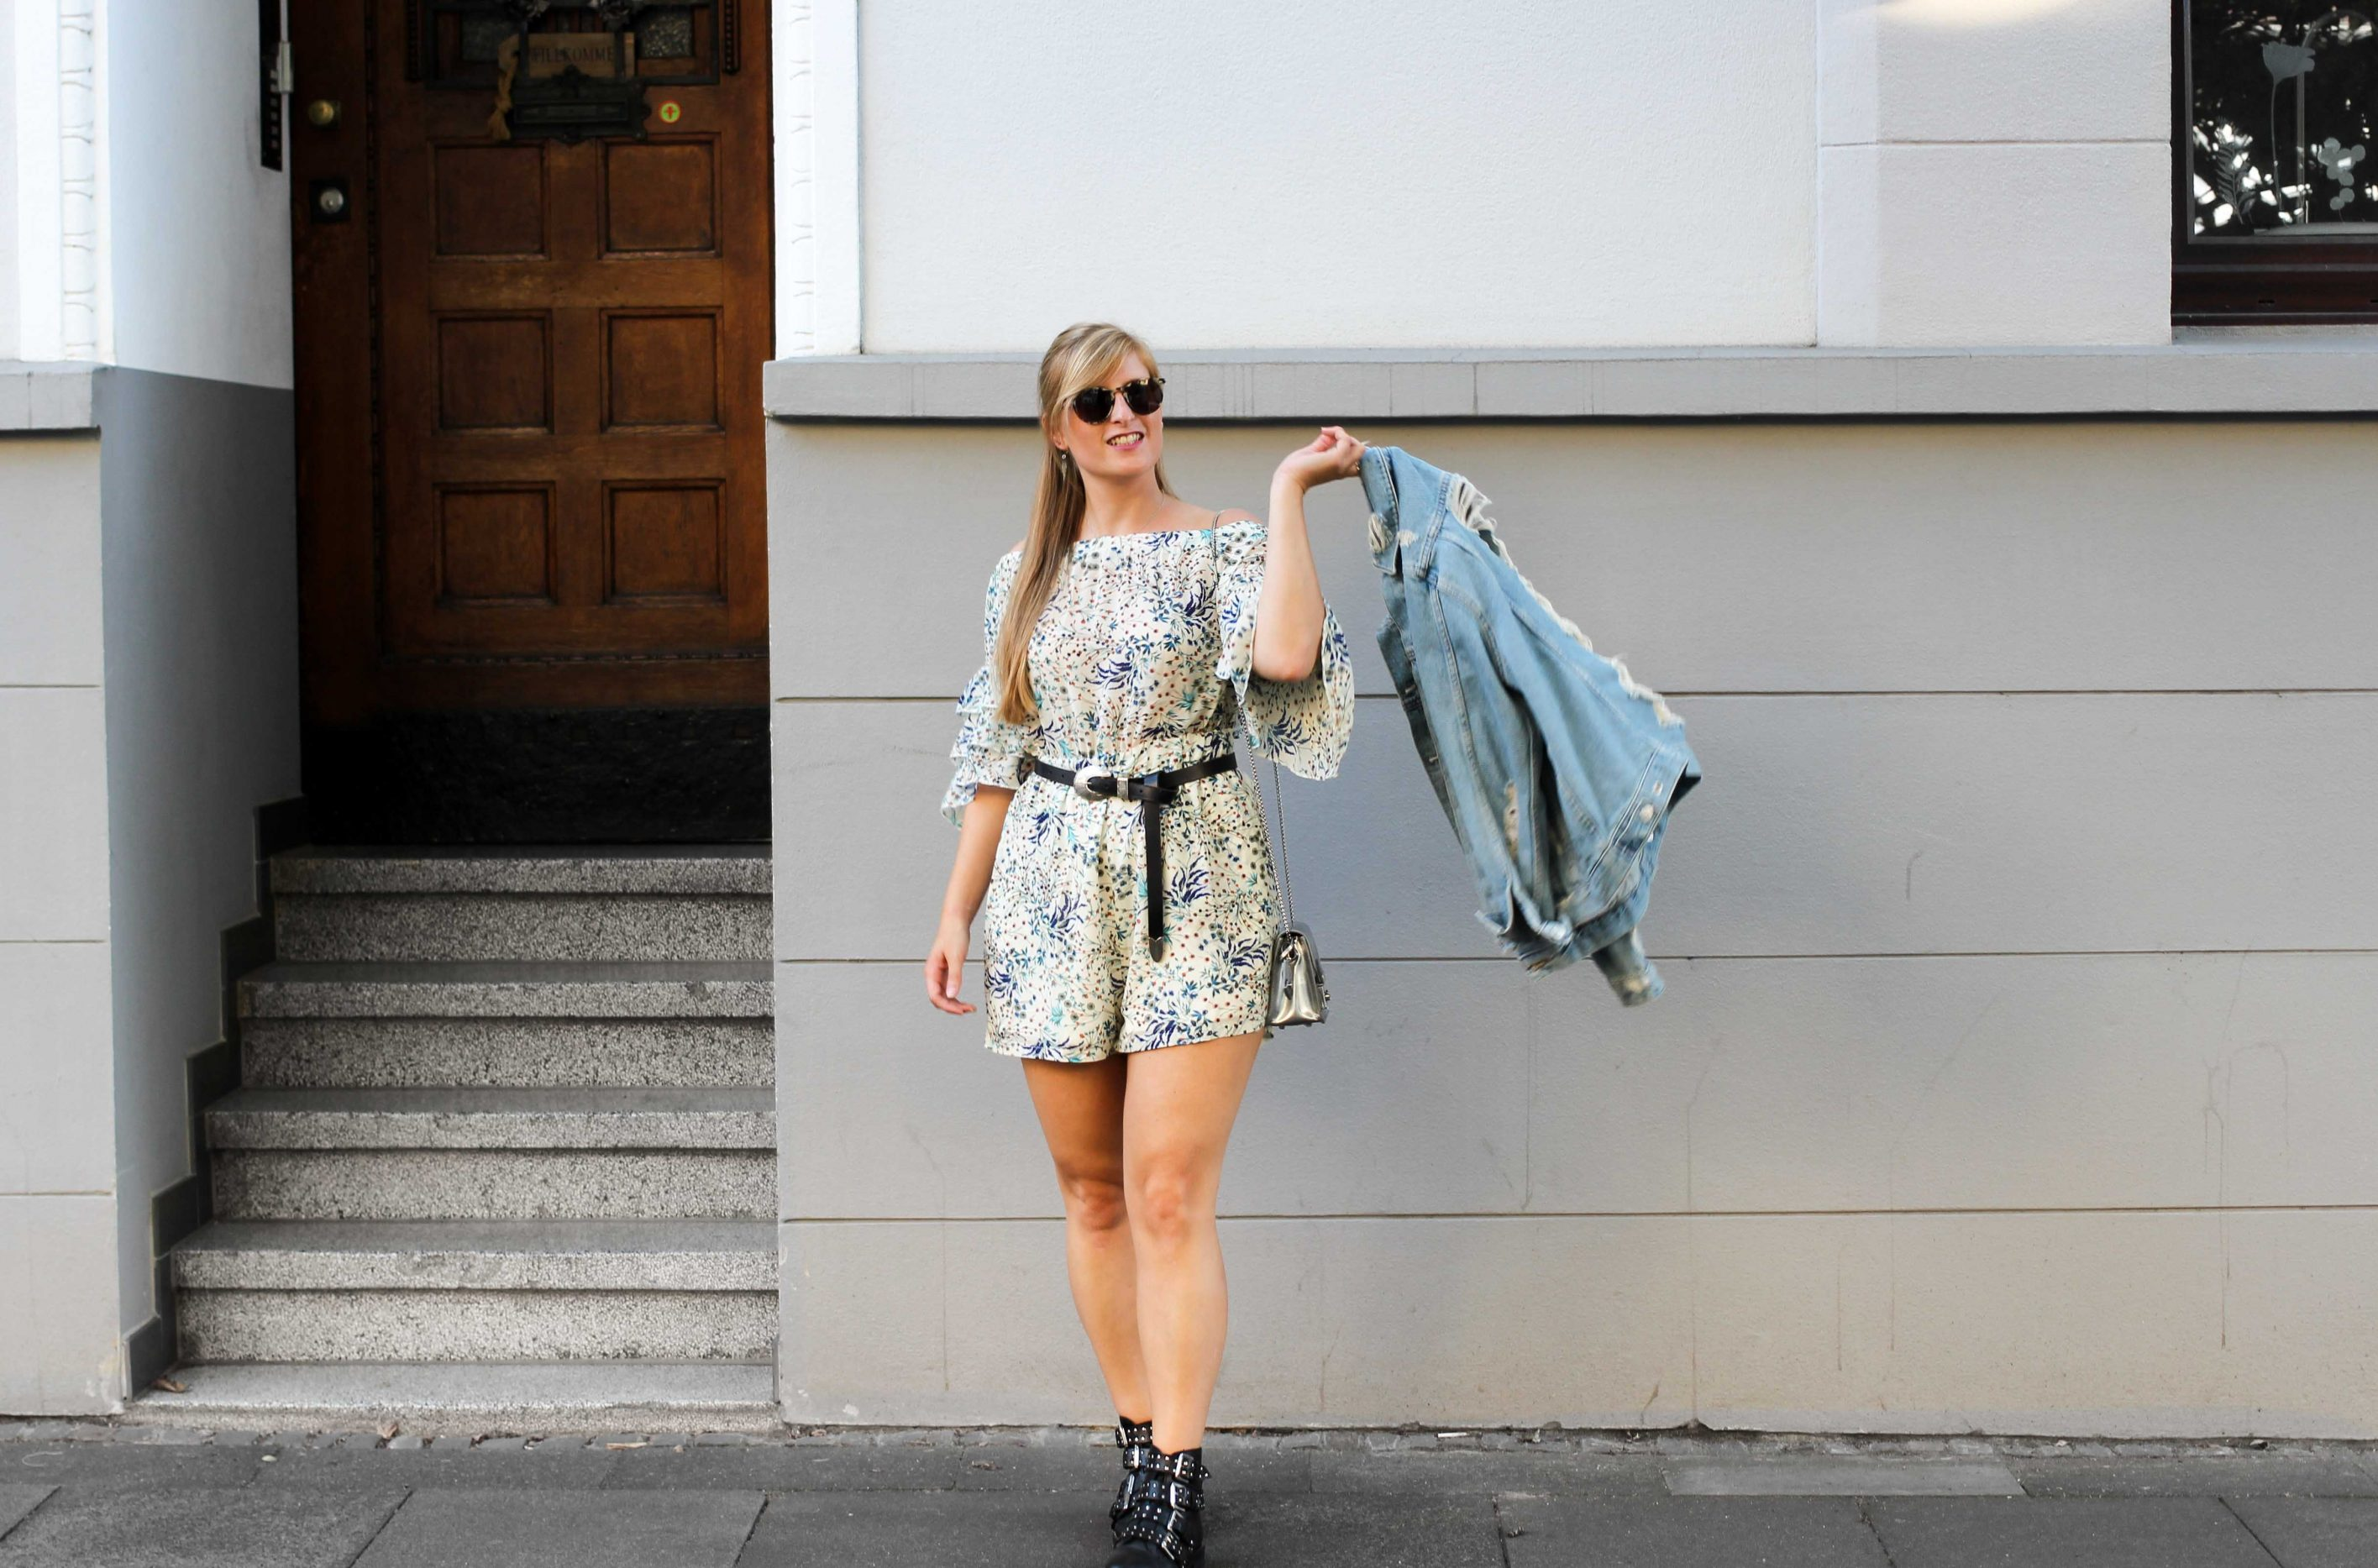 Blumenprint Jumpsuit Offshoulder IRL Collection Vipsters Ripped Jeansjacke rockige Boots Nietenboots kombinieren Outfit Herbst Modeblog 0